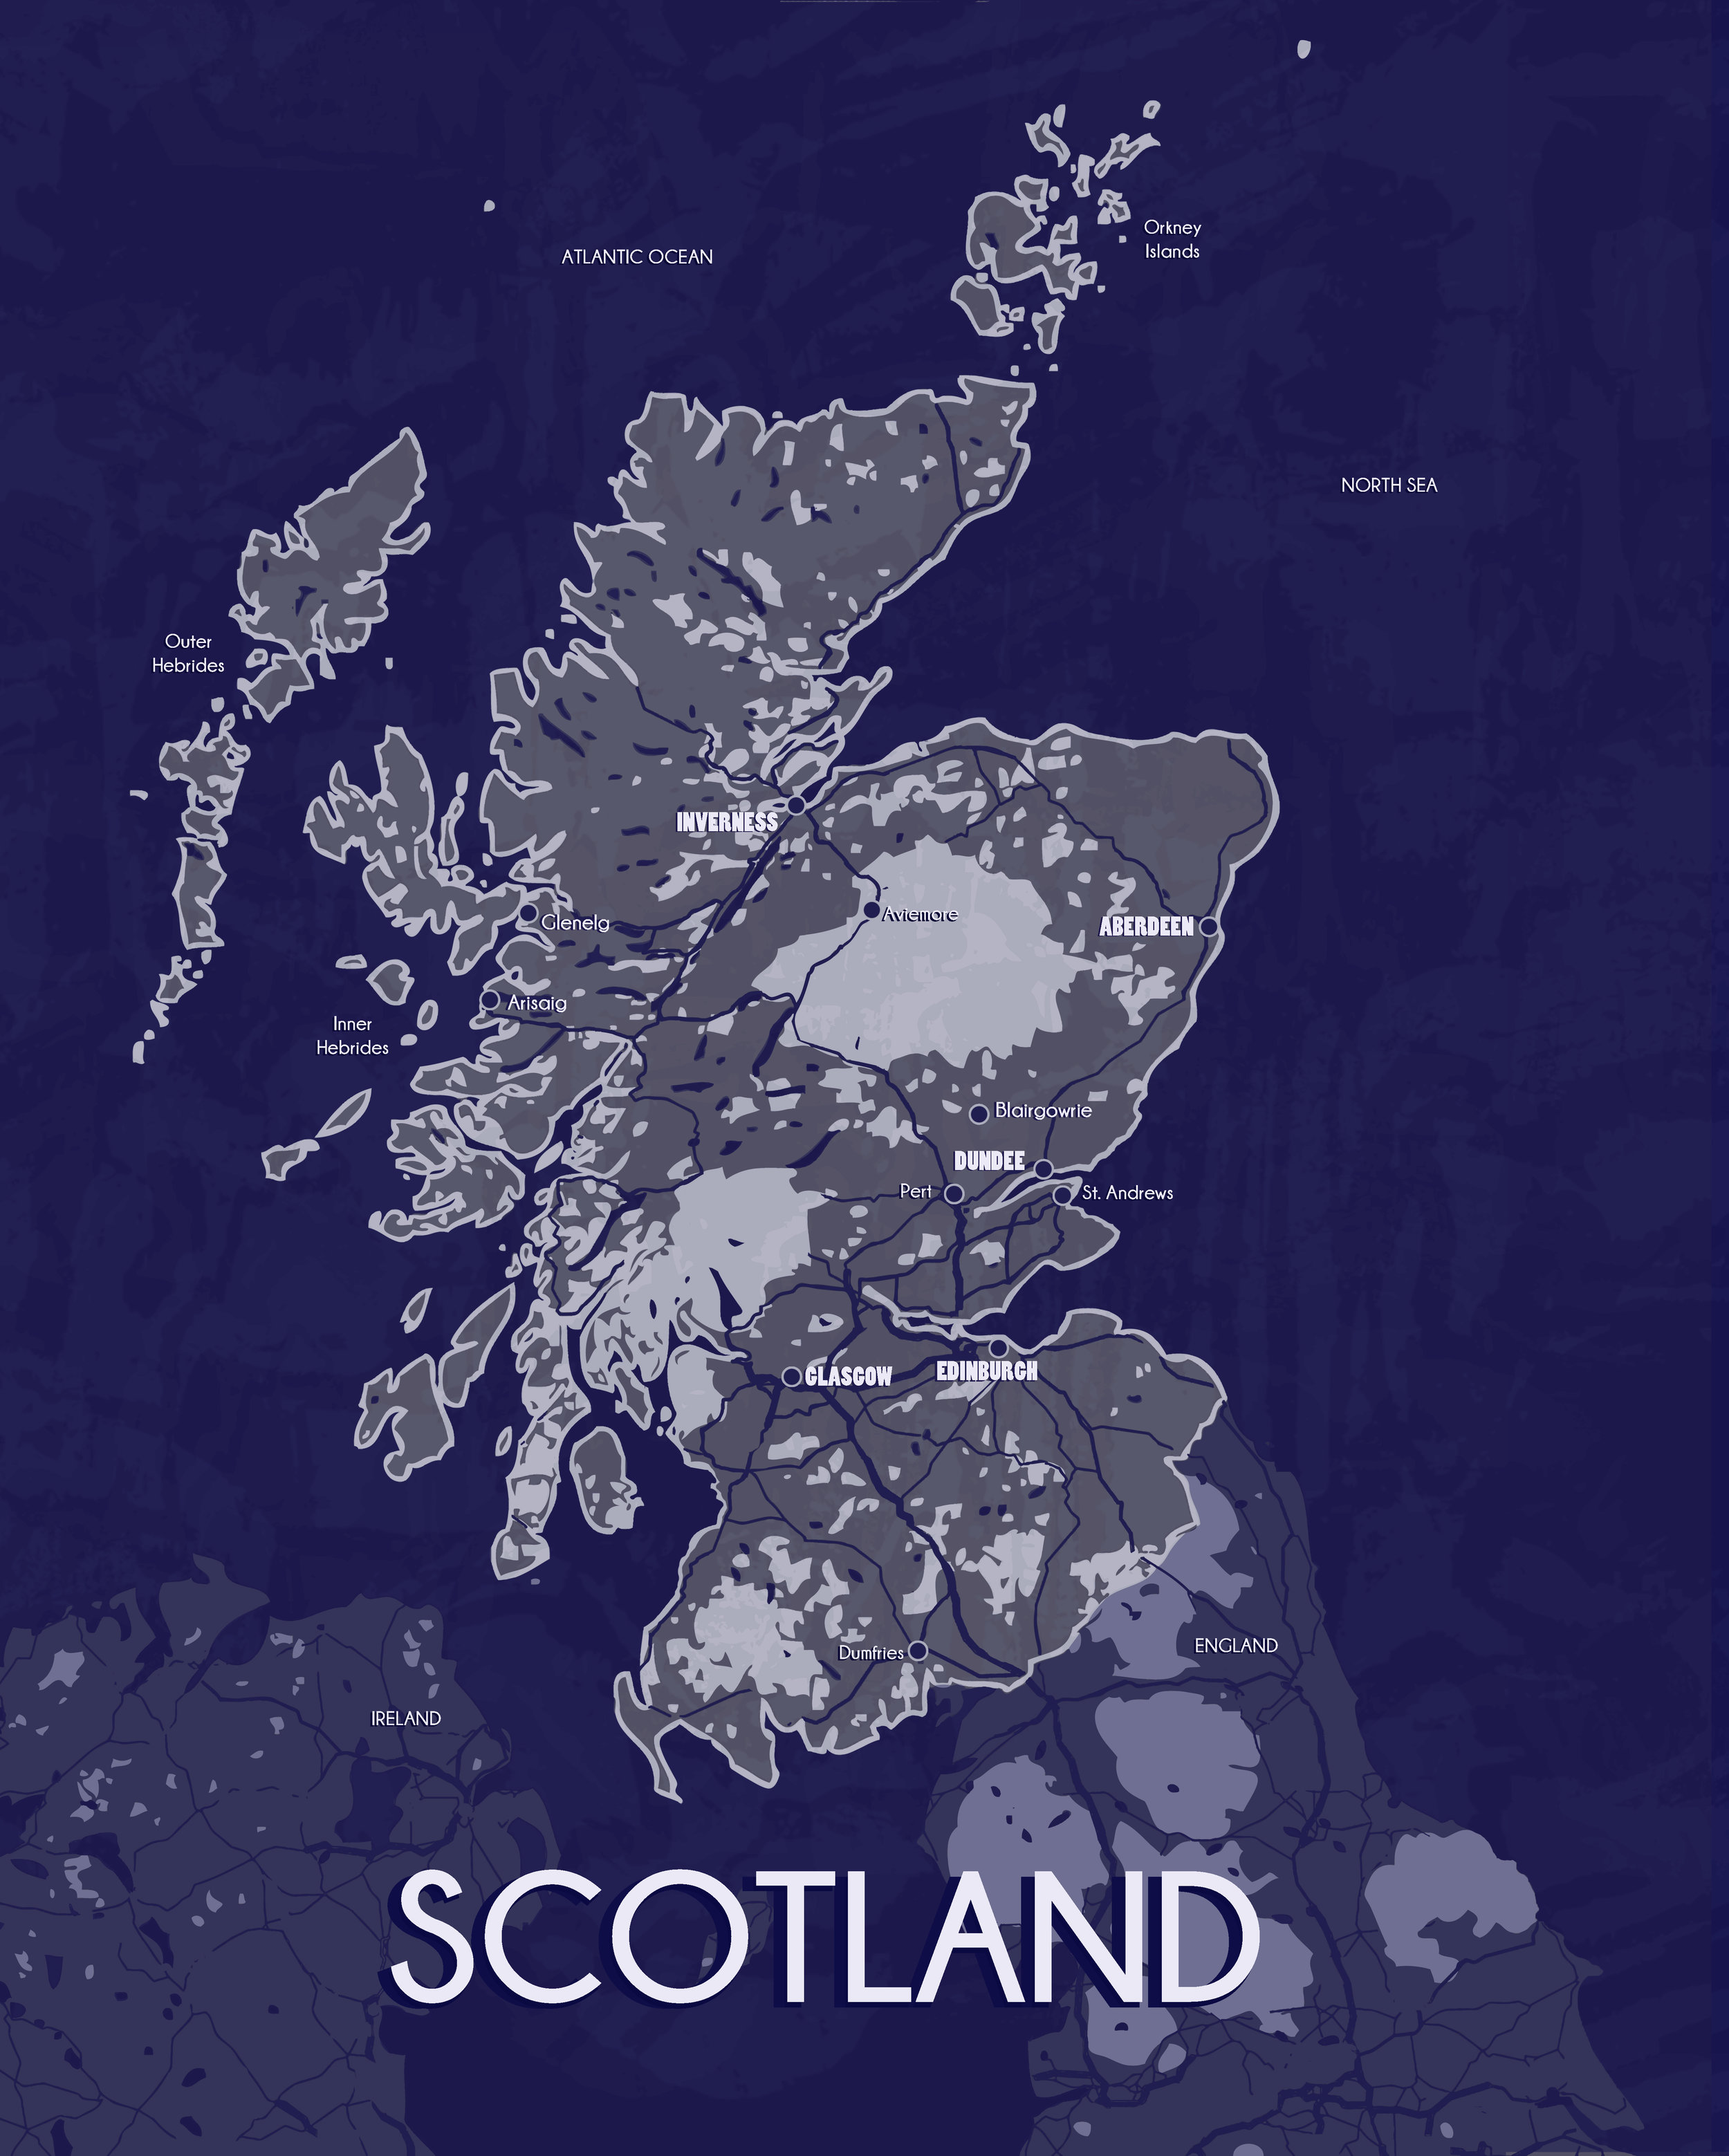 Scotland, 2016